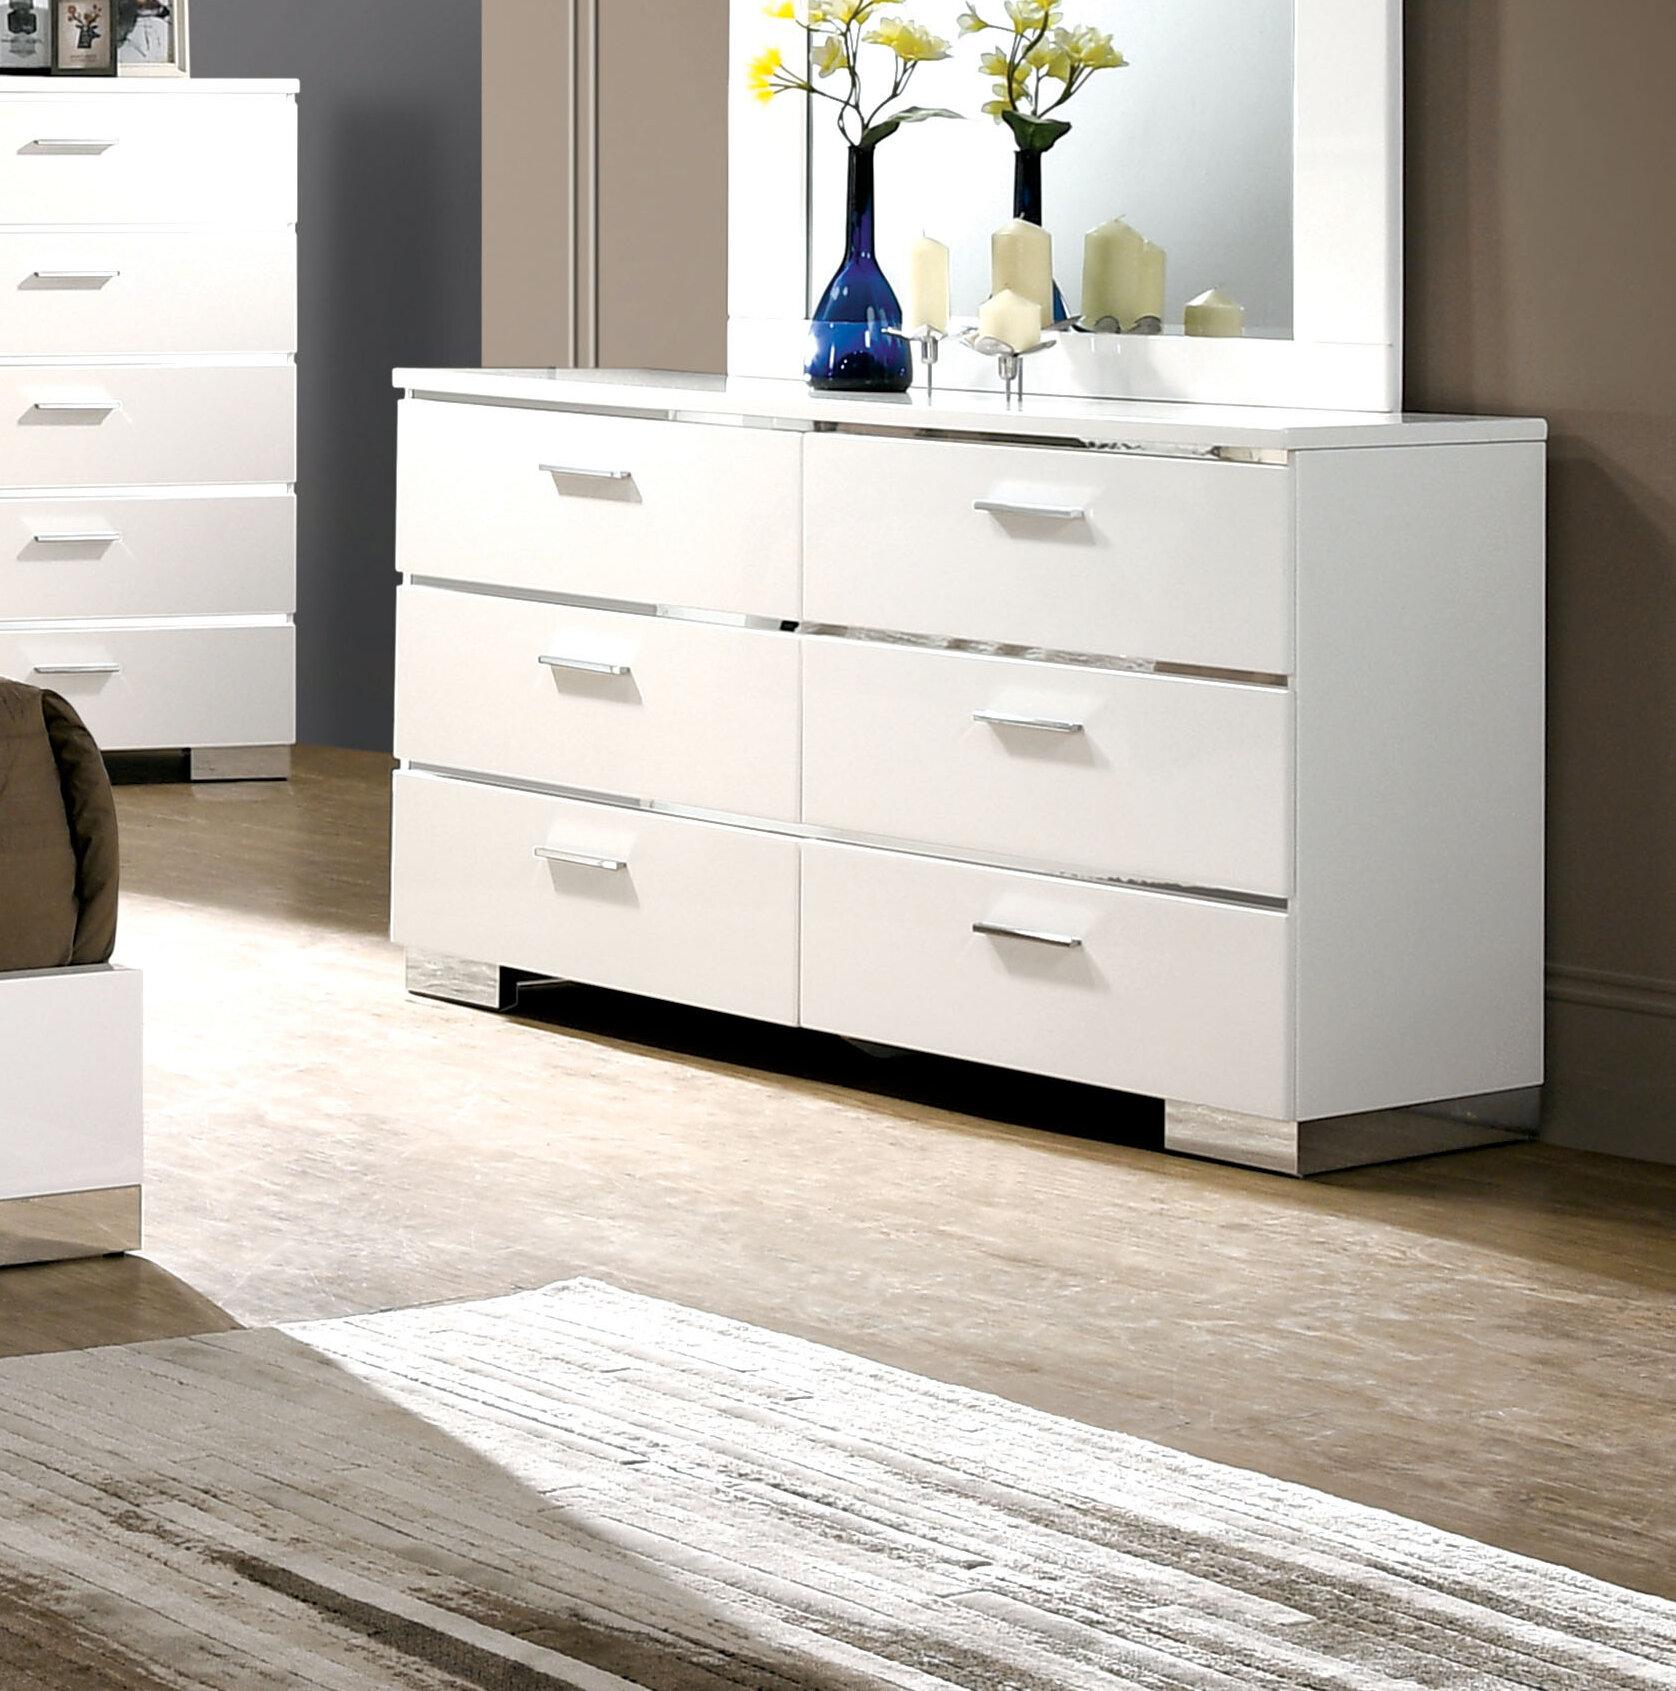 Brayden Studio Ricka 6 Drawer Double Dresser Reviews Wayfair